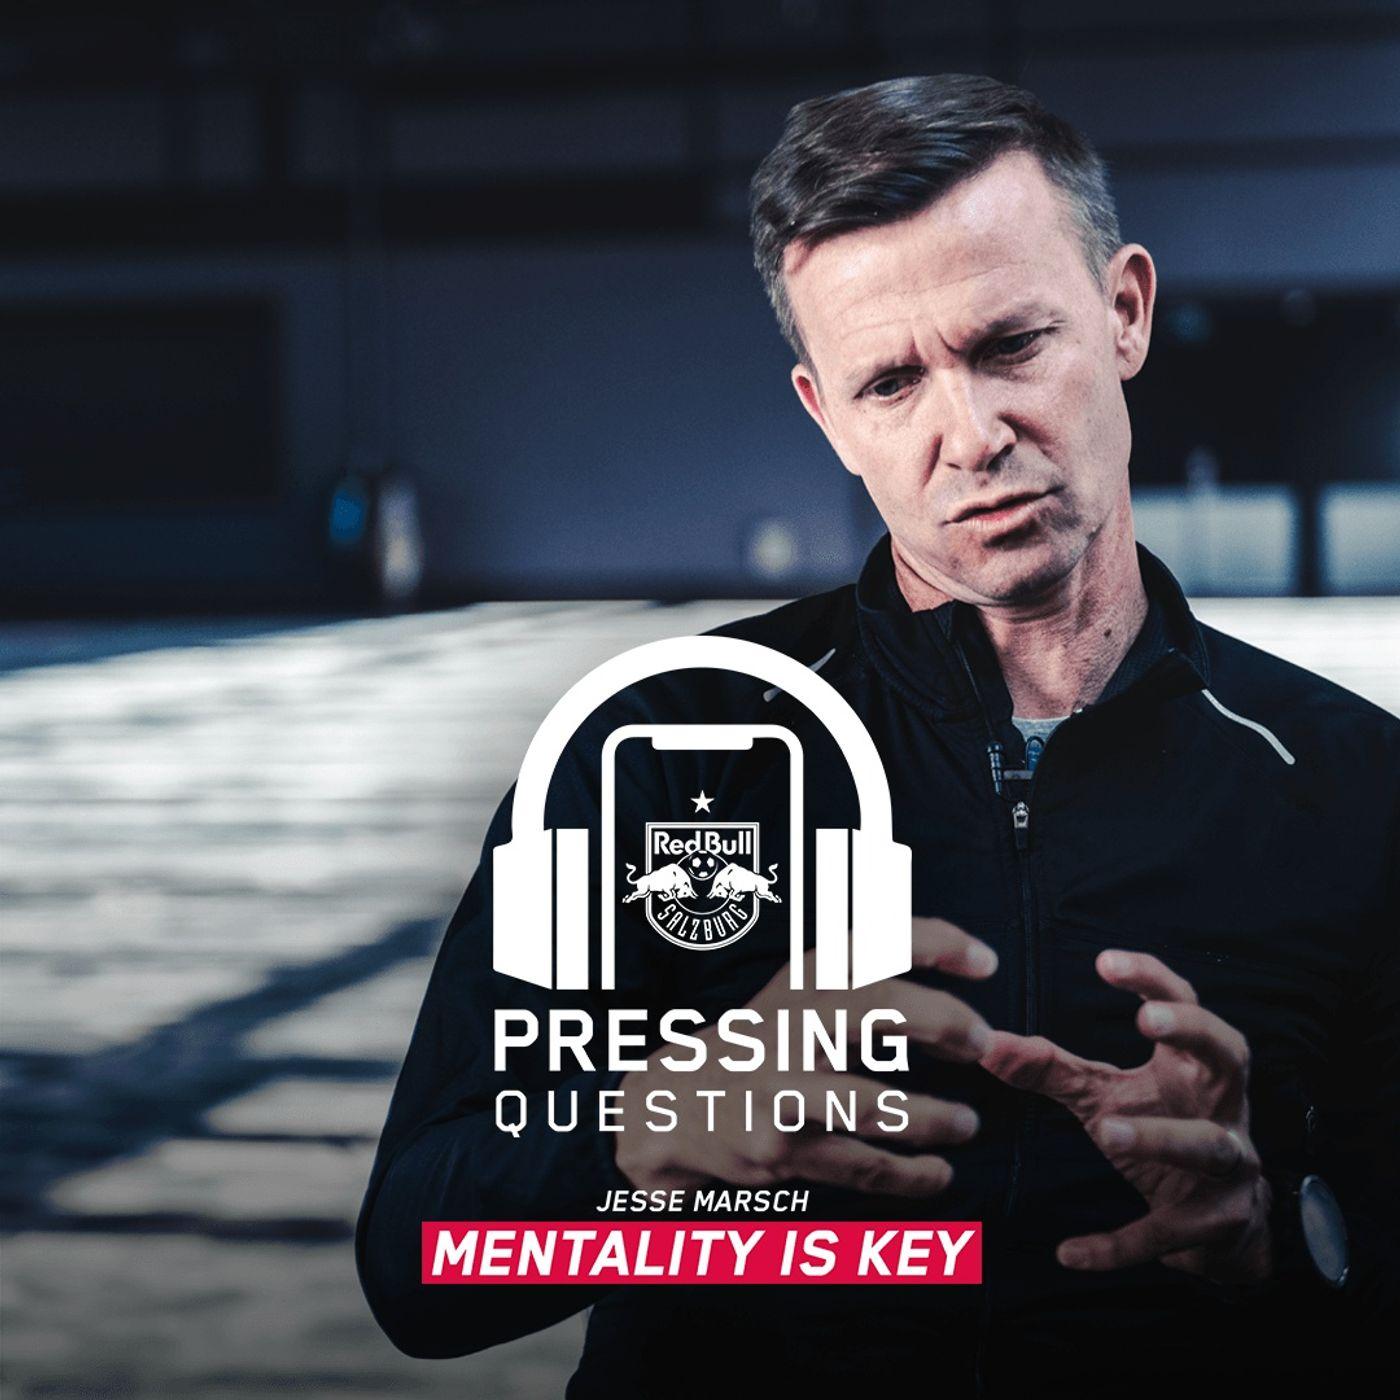 Jesse Marsch – Mentality is key